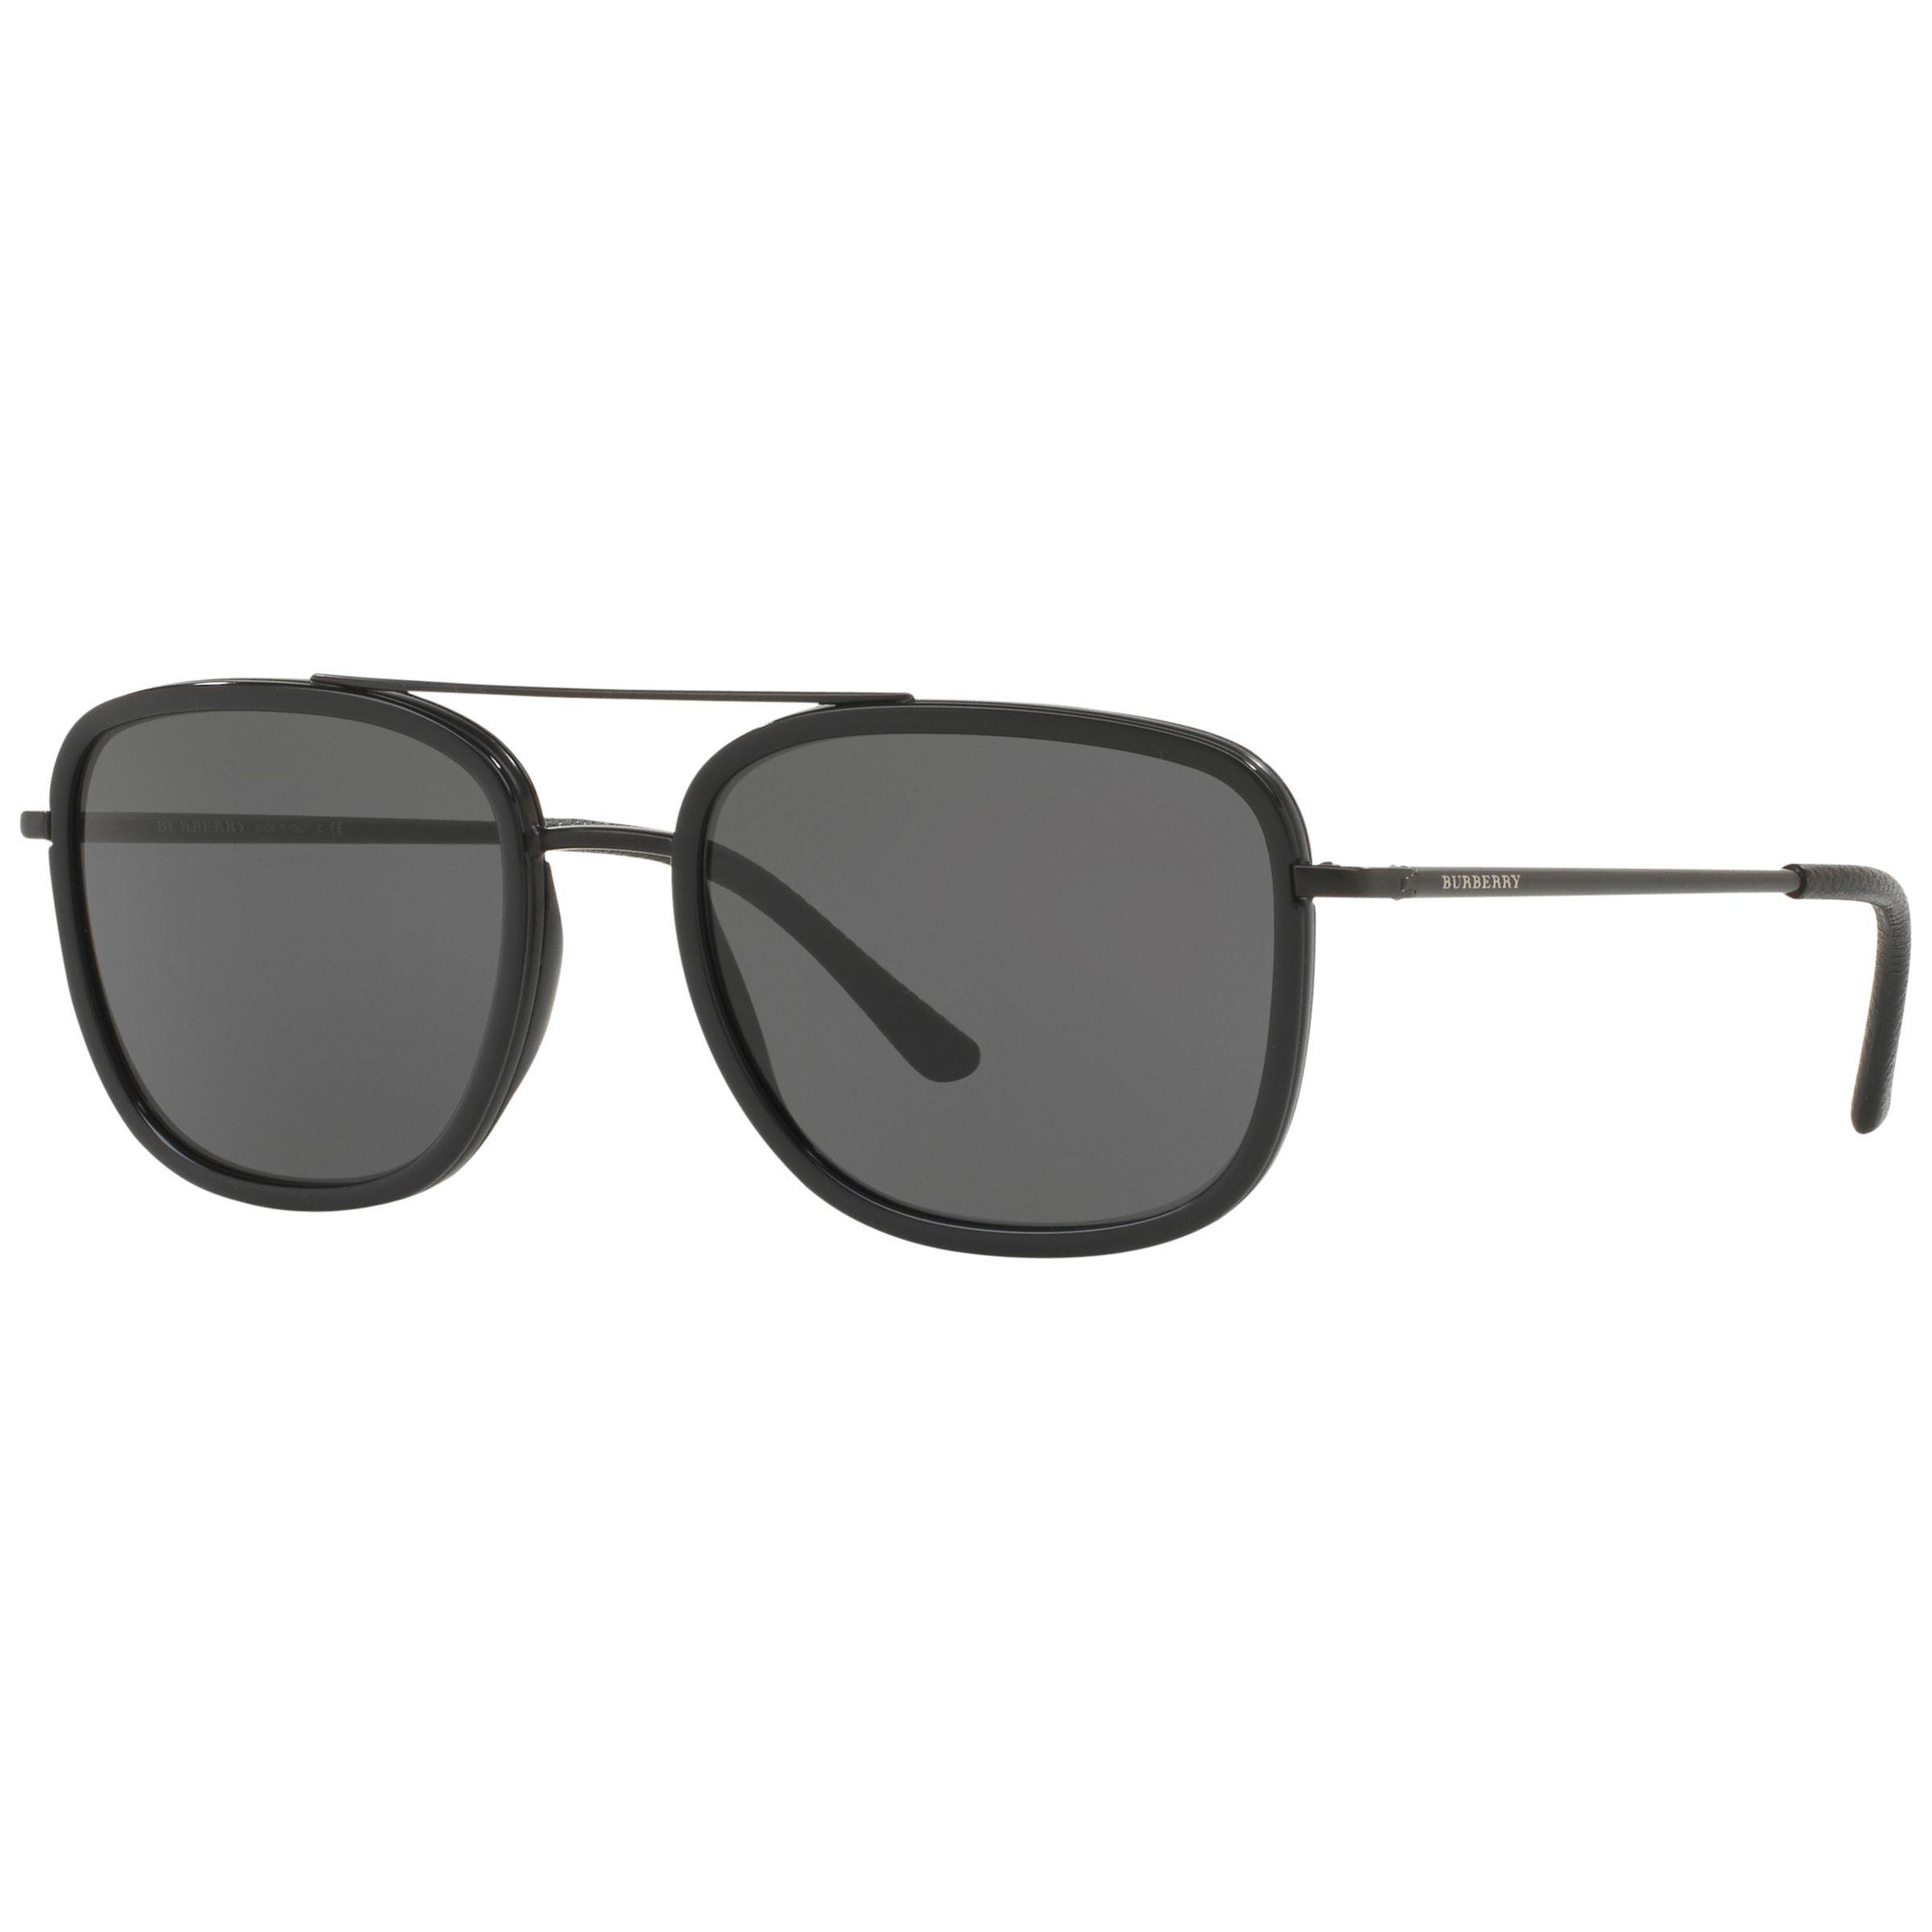 5f922714de1 Burberry Be3085 Square Sunglasses in Black for Men - Lyst